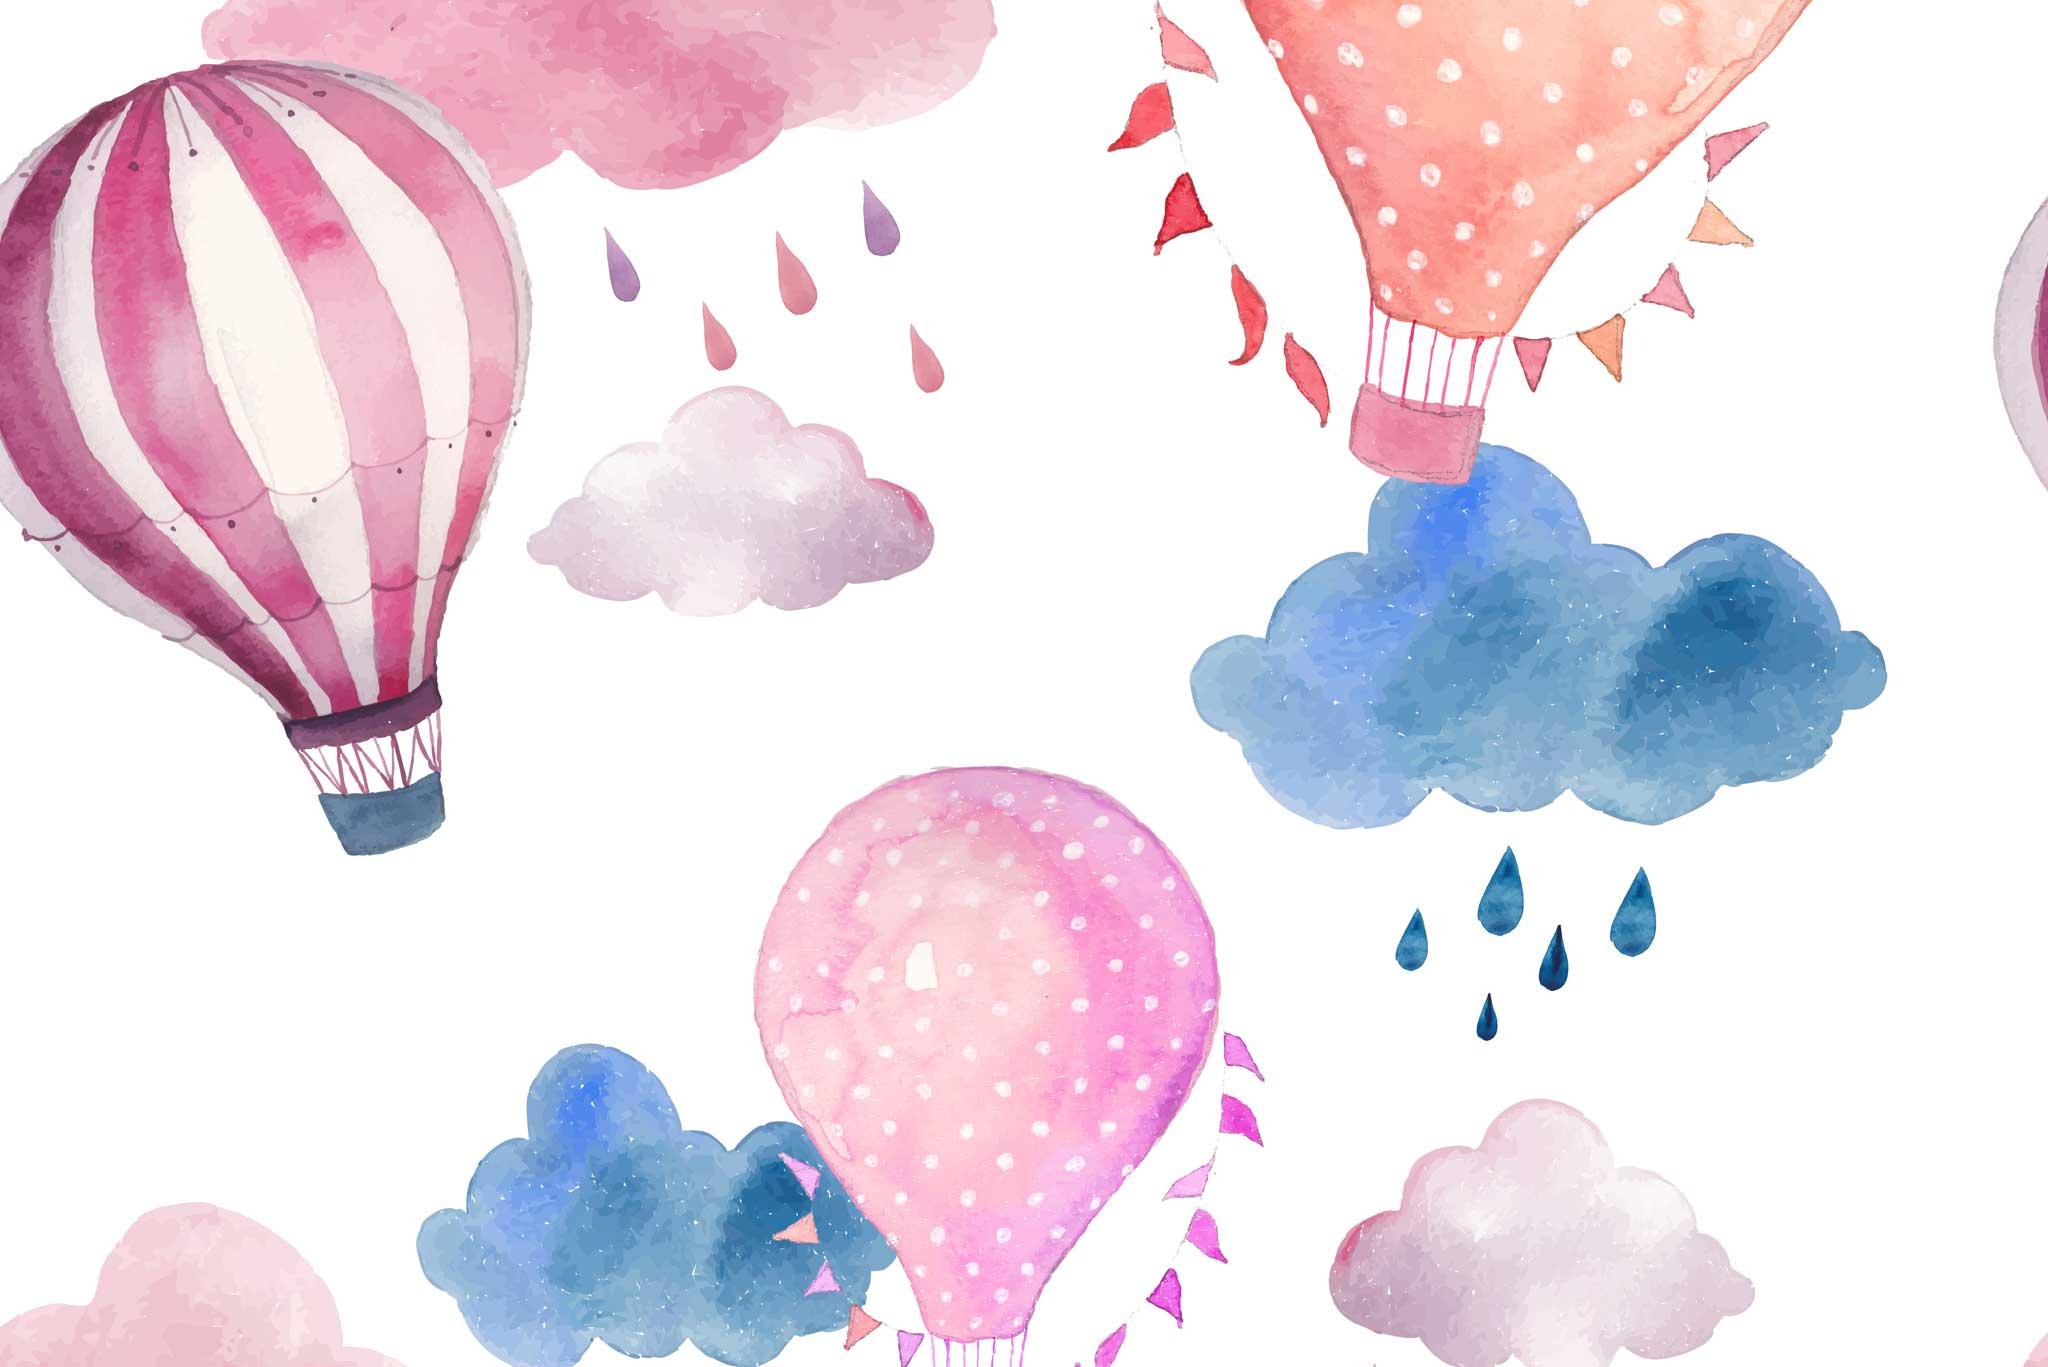 tapet-fototapet-design-decor-mural-customizabil-comanda-personalizat-bucuresti-daring-prints-motiv-model-copii-desen-baloane-aer-norisori-roz-alb